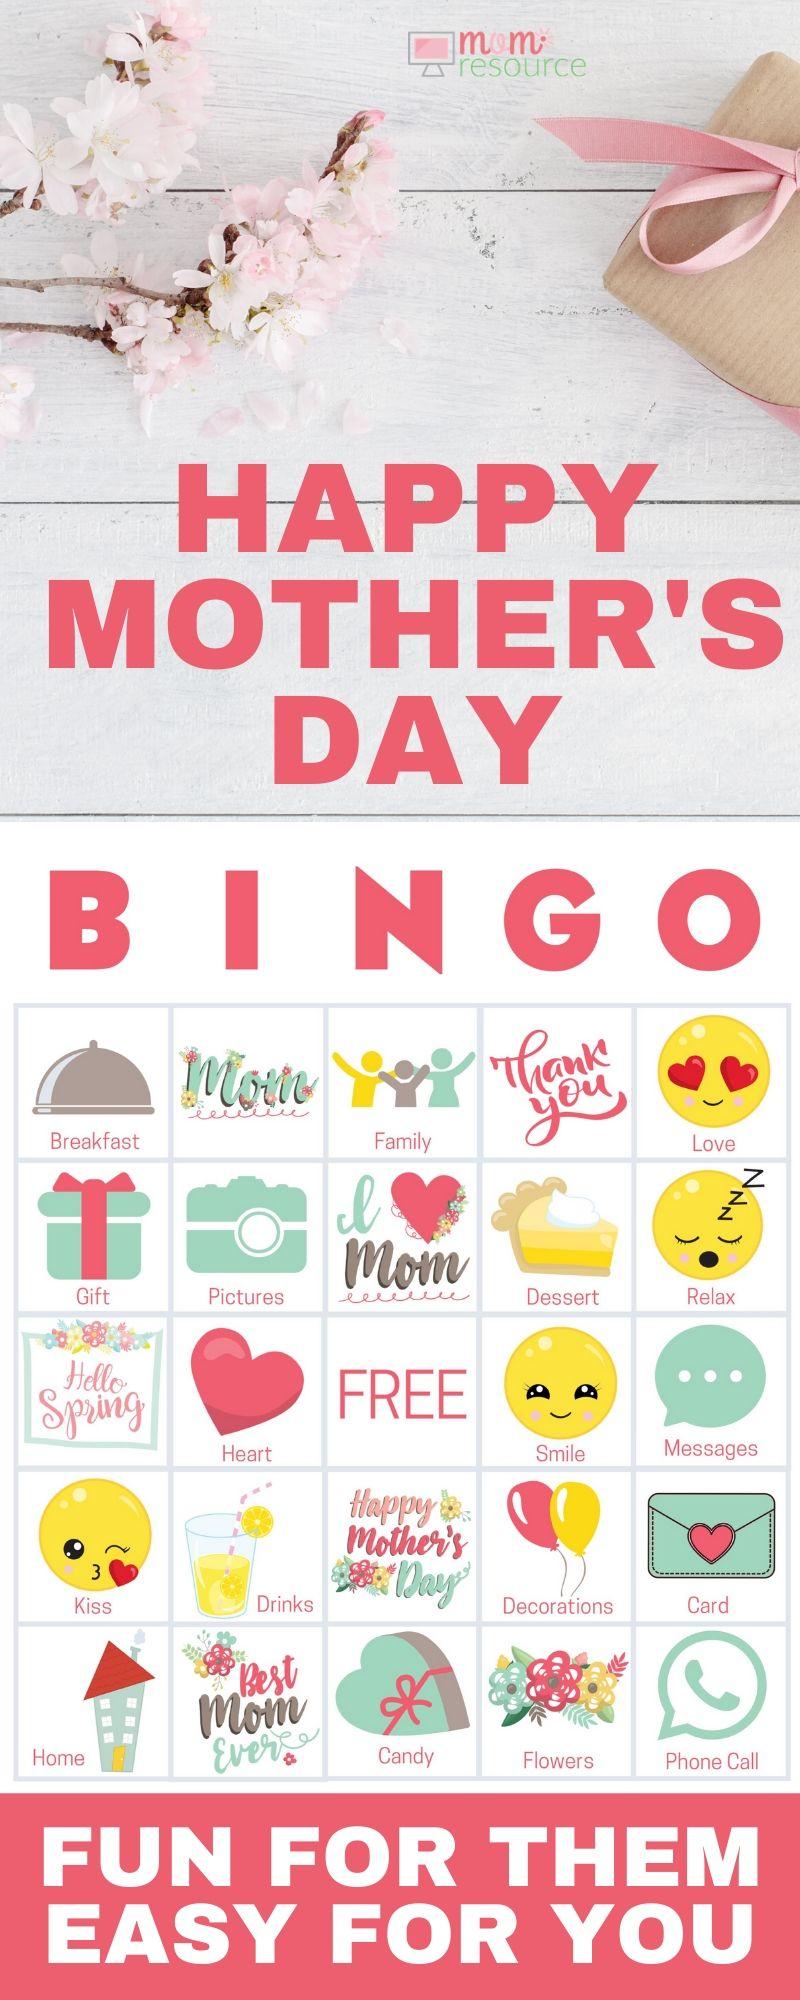 mother's day bingo card game  easy modern  fun in 2020